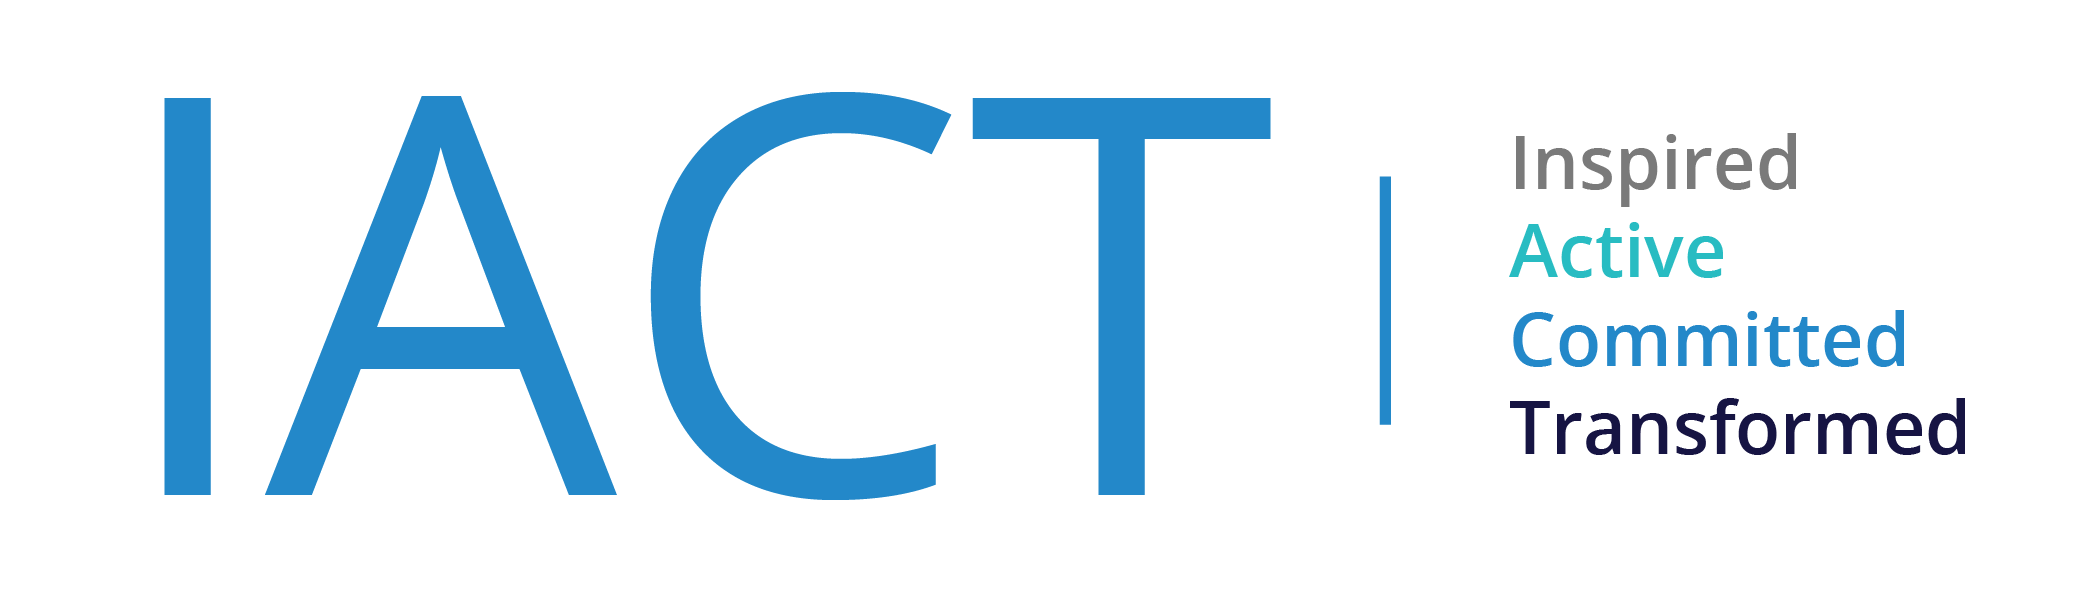 IACT-logo-01 (1).png